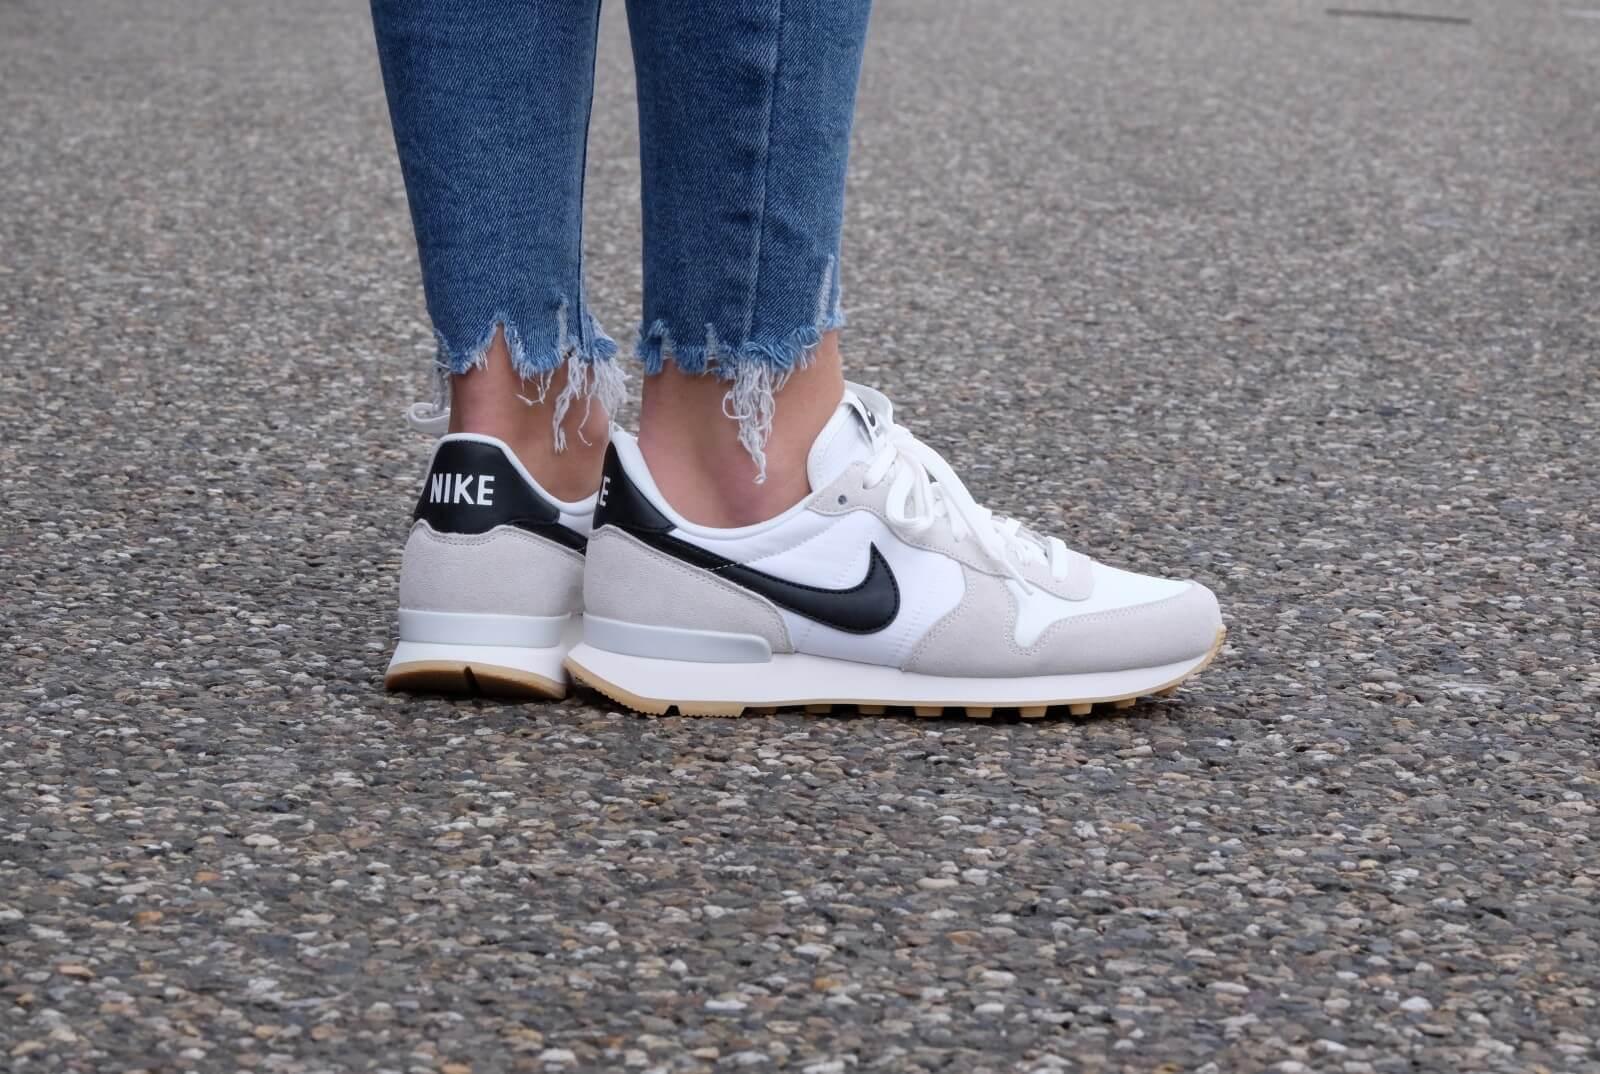 Nike Wmns Internationalist Summit White Black Gum Yellow